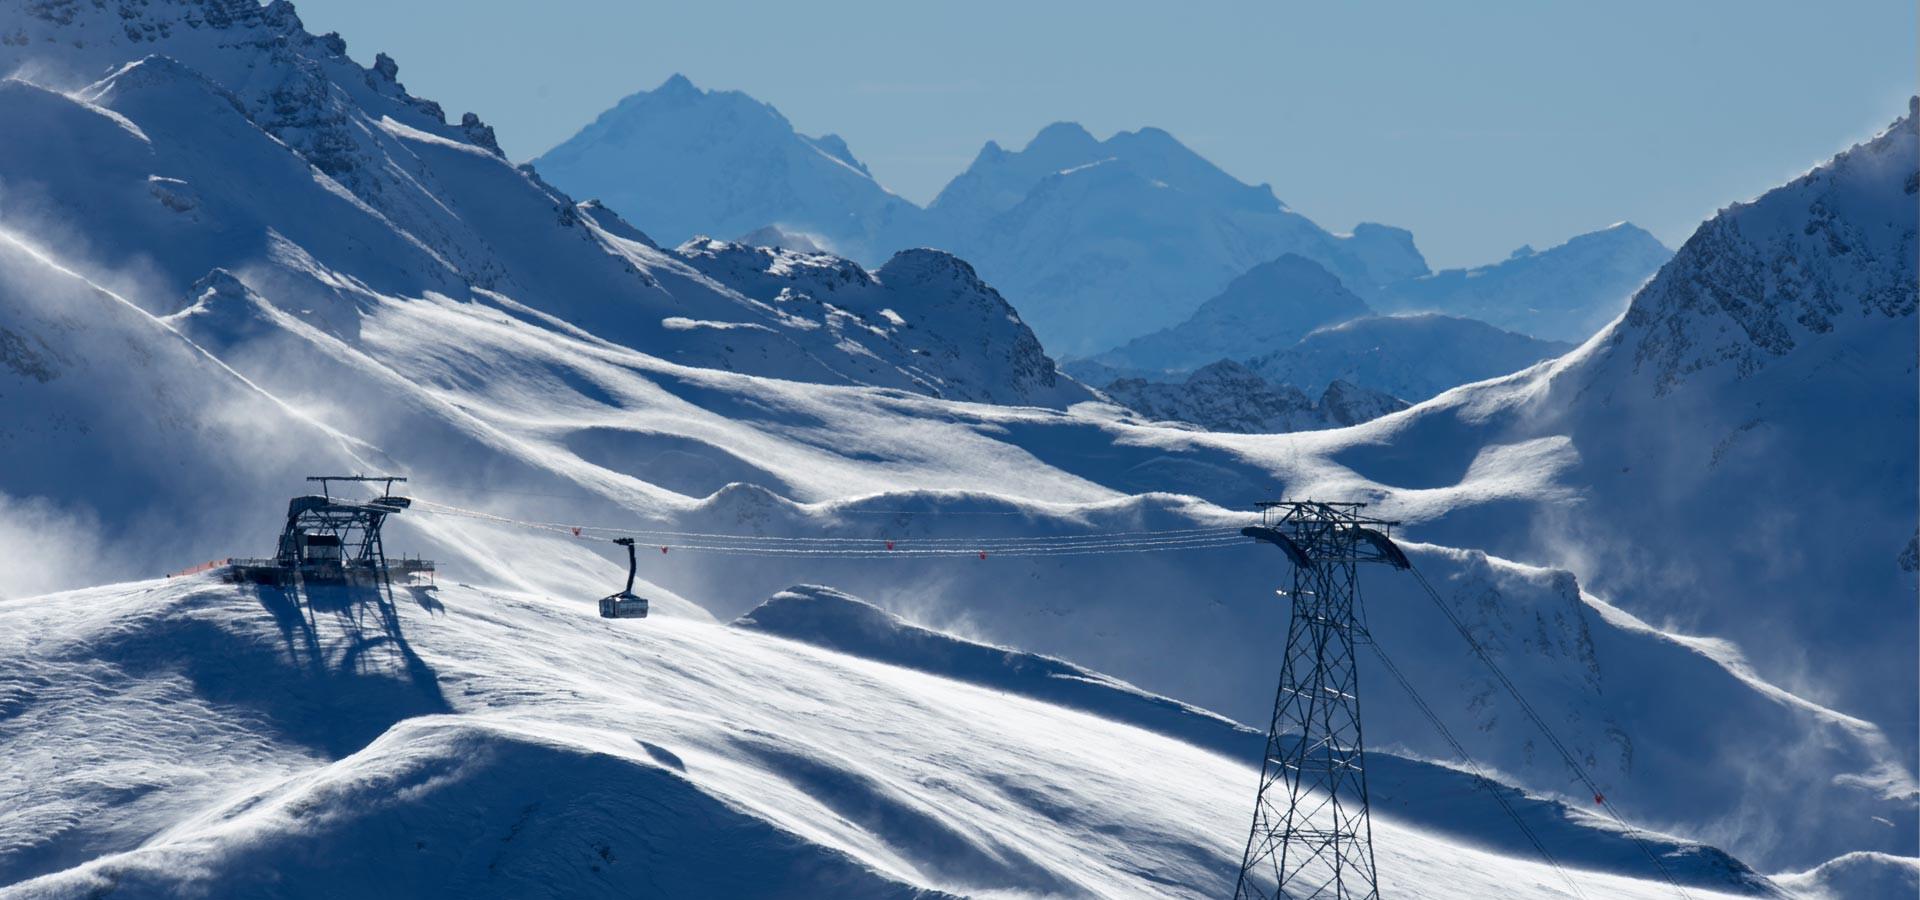 Silvretta Arena ski resort  pure skiing pleasure and guaranteed snow